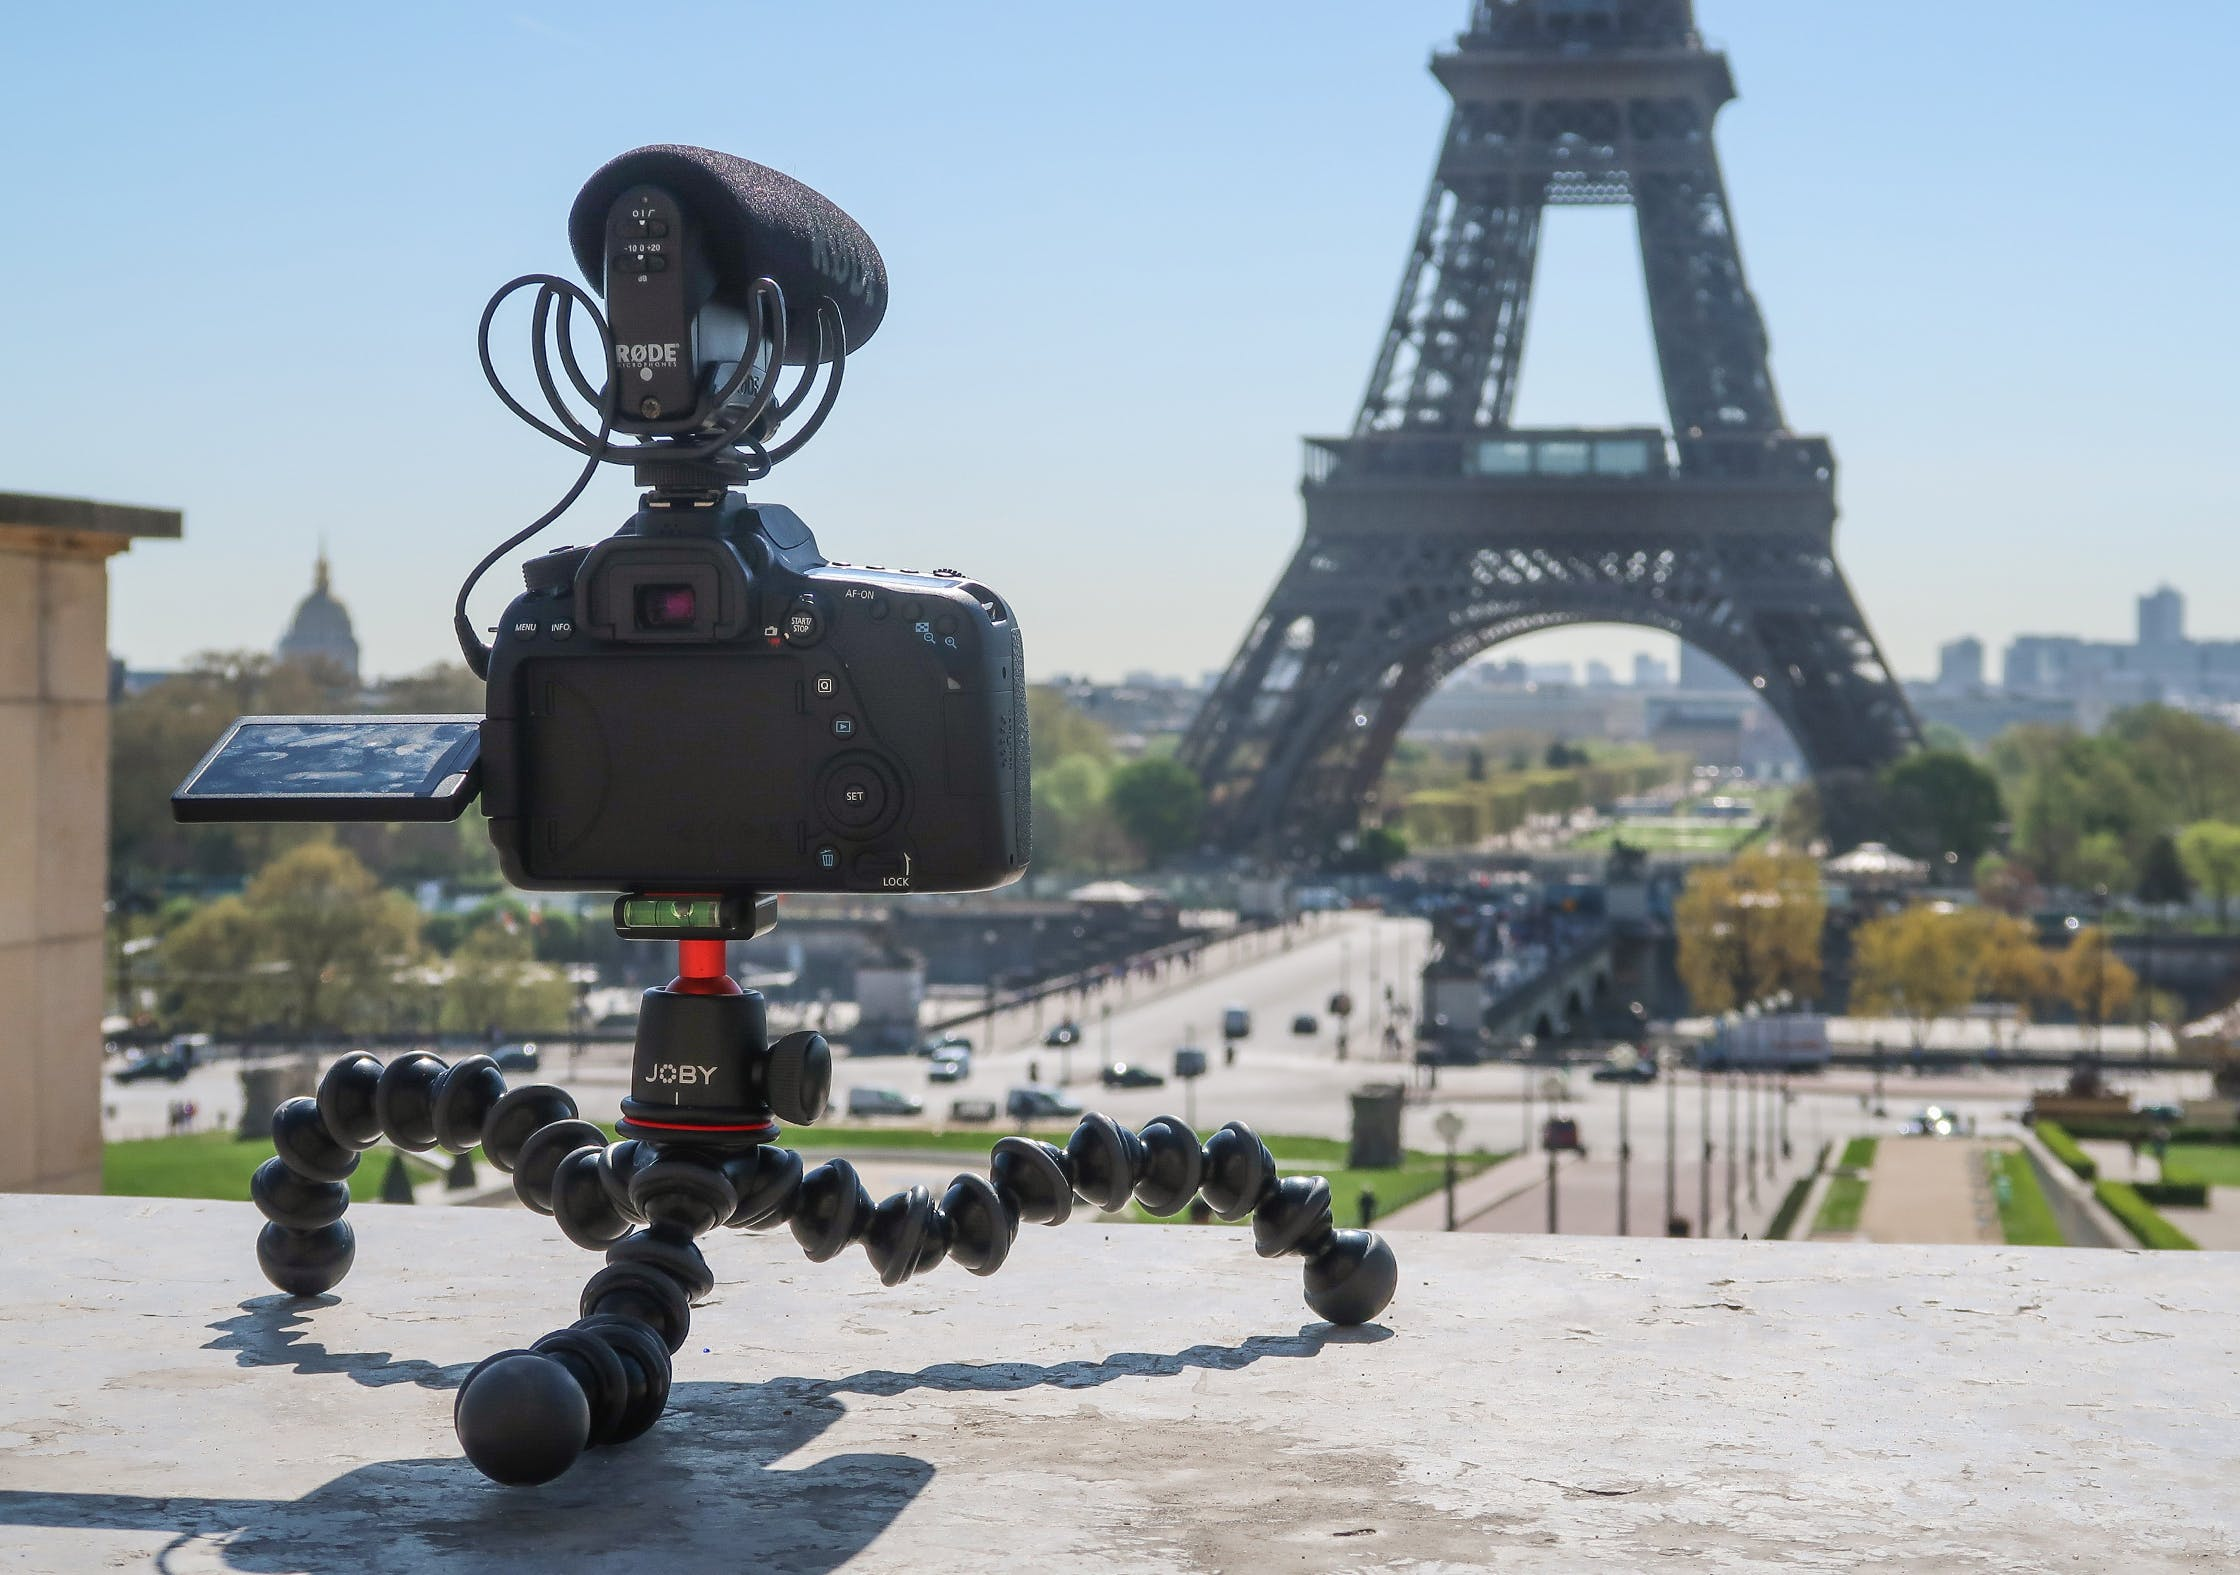 JOBY GorillaPod 3K At The Eiffel Tower In Paris, France